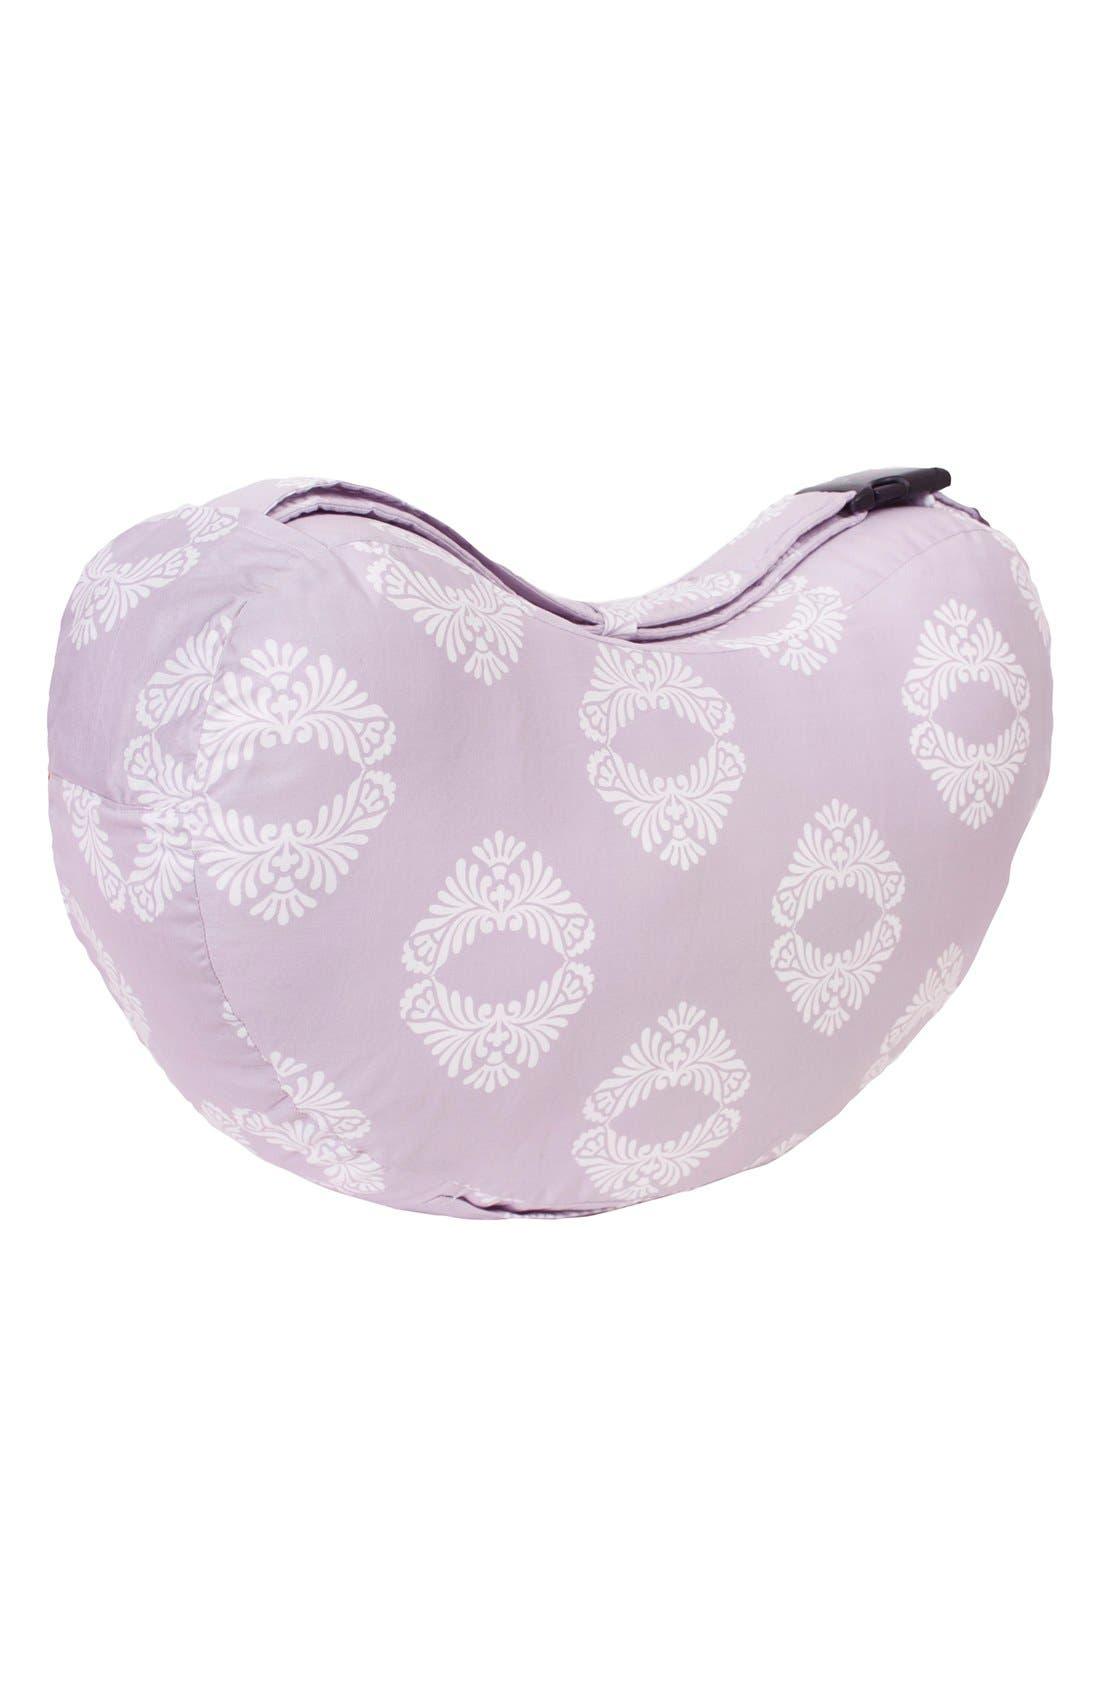 Nursing Pillow,                             Alternate thumbnail 2, color,                             Light Purple/ White